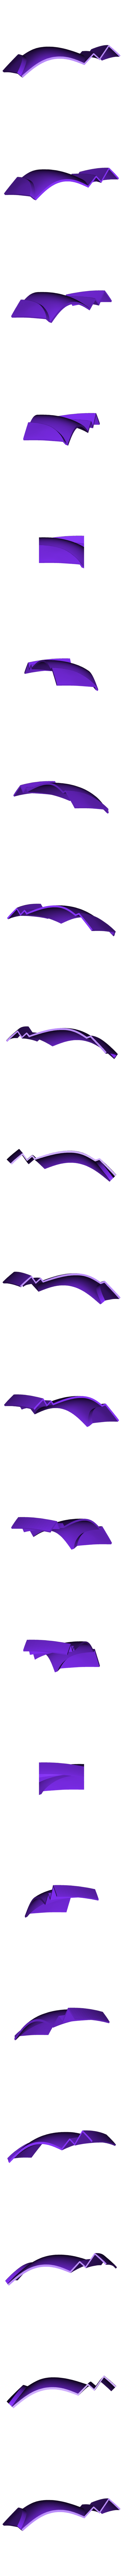 Part_3_v2.stl Download free STL file Senate Guard Helmet (Star Wars) • 3D printer design, VillainousPropShop